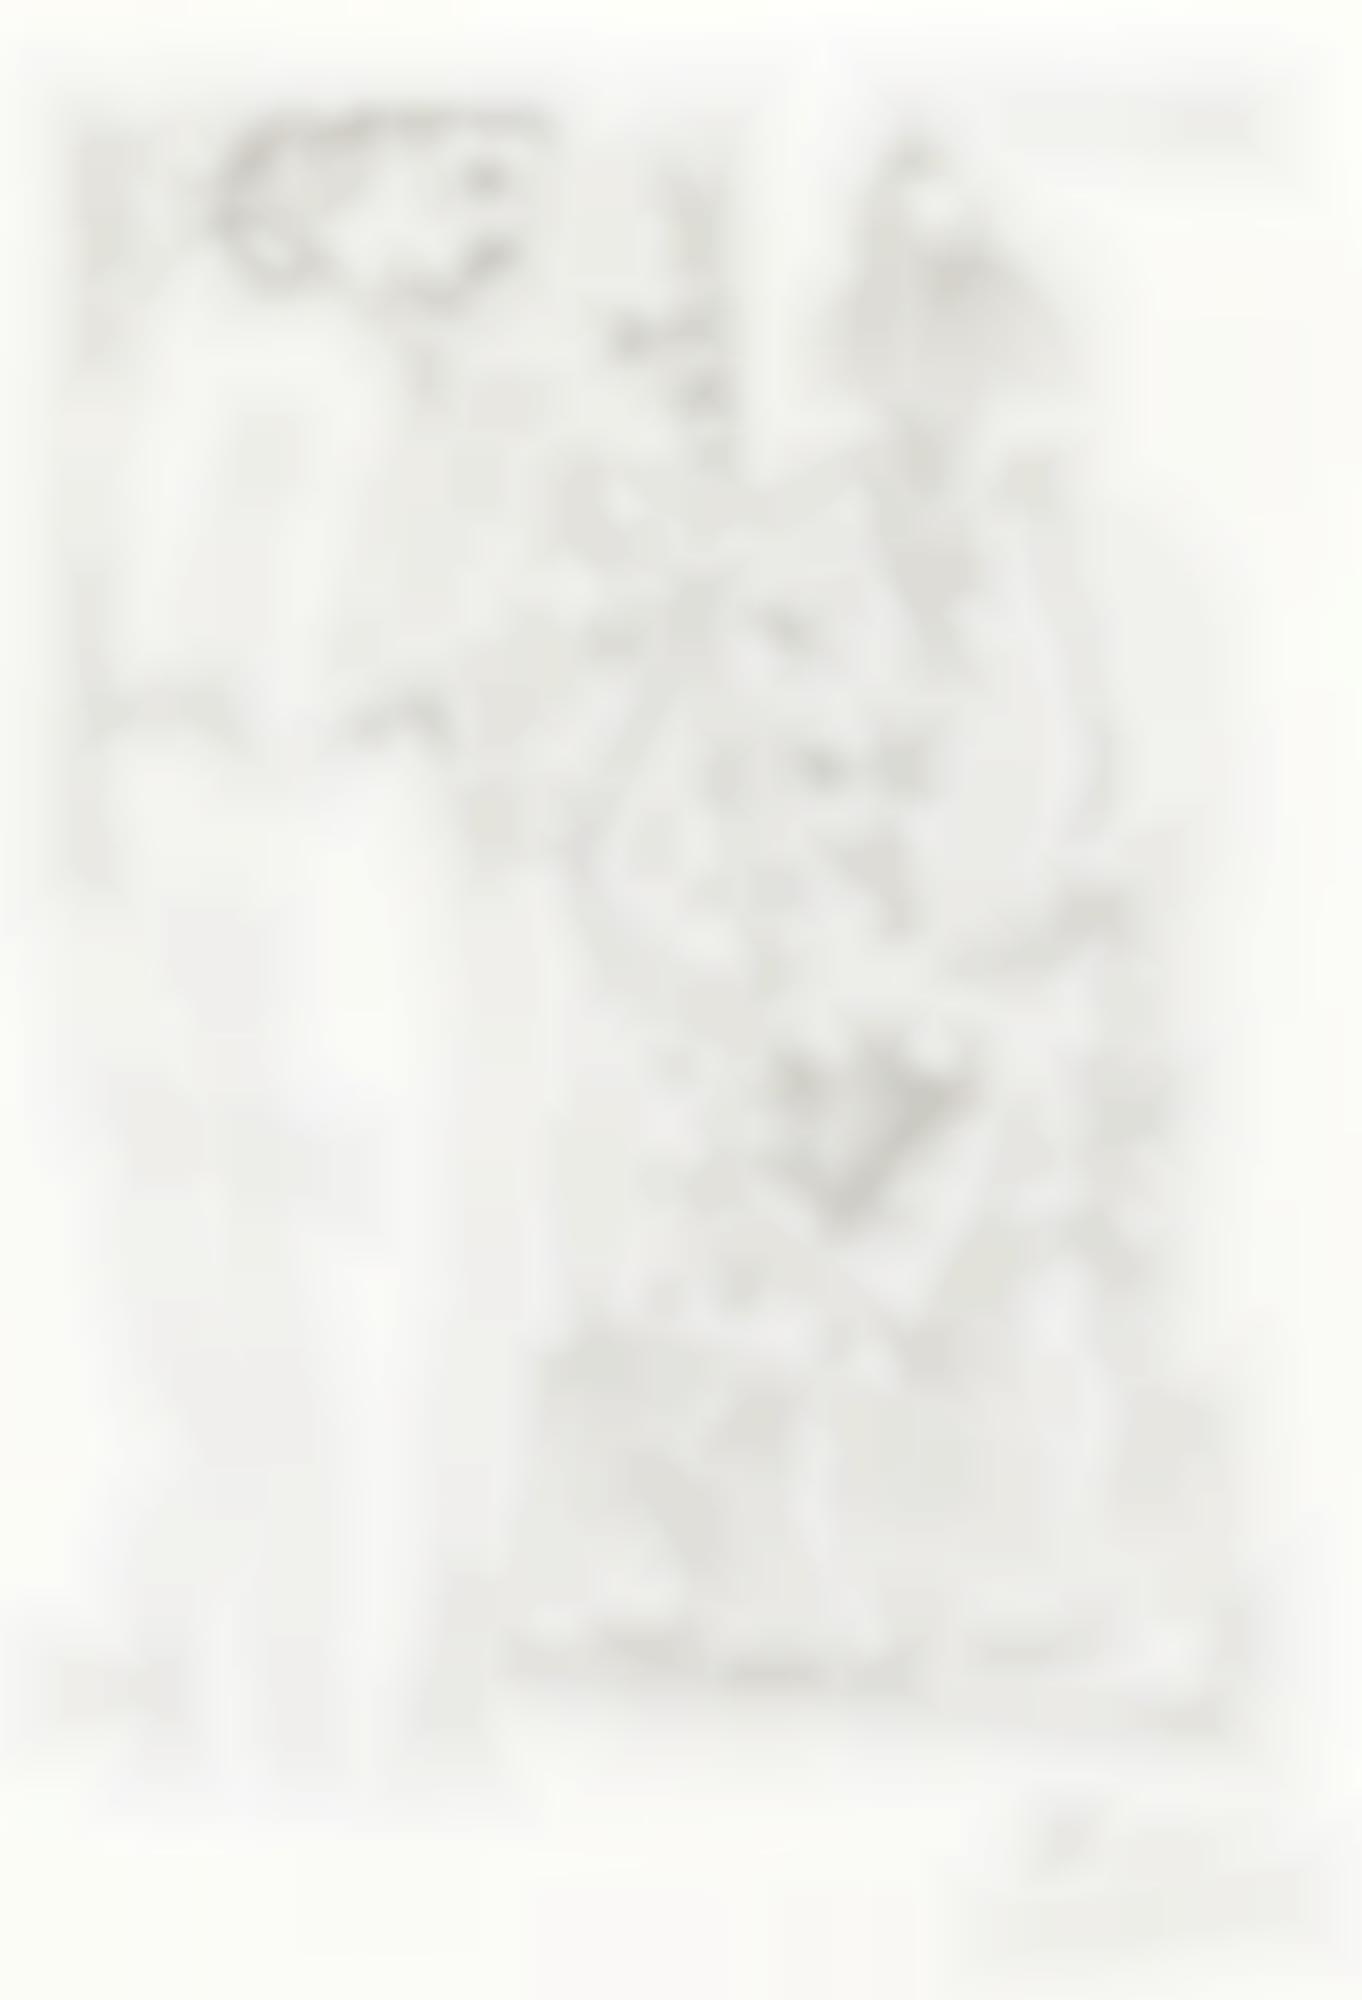 Pablo Picasso-Marie-Therese Considerant Son Effigie Surrealiste Sculptee(B. 187; Ba. 346)-1933